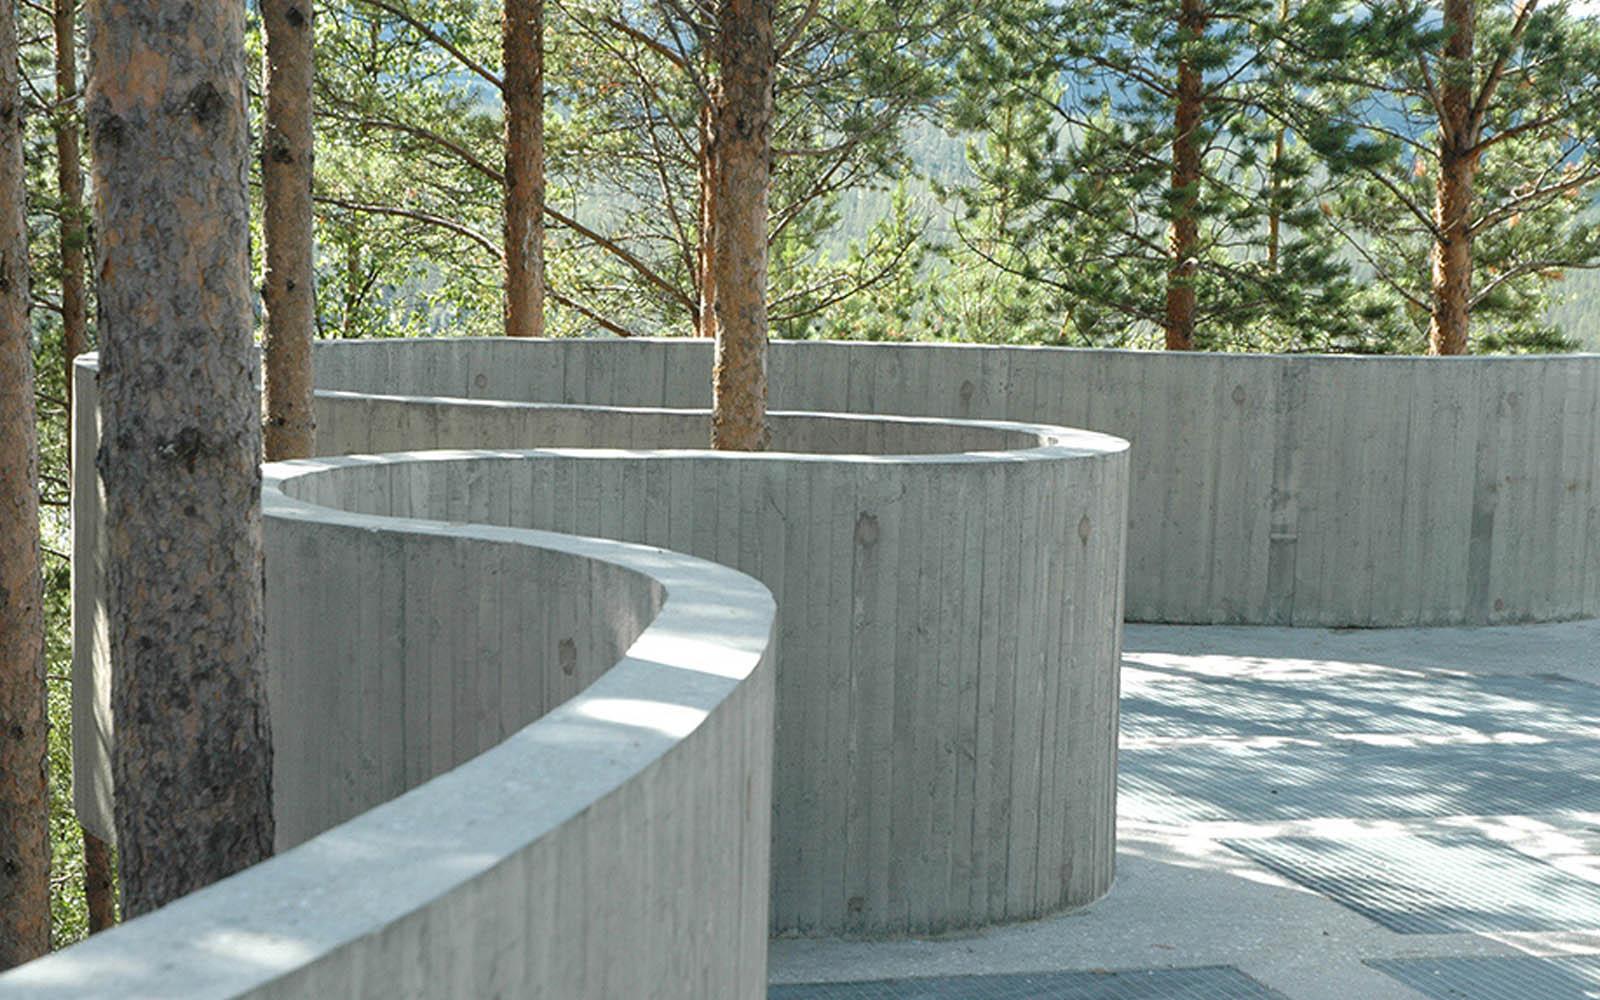 Image of the concrete curve platform at Sohlbergplassen, Norway